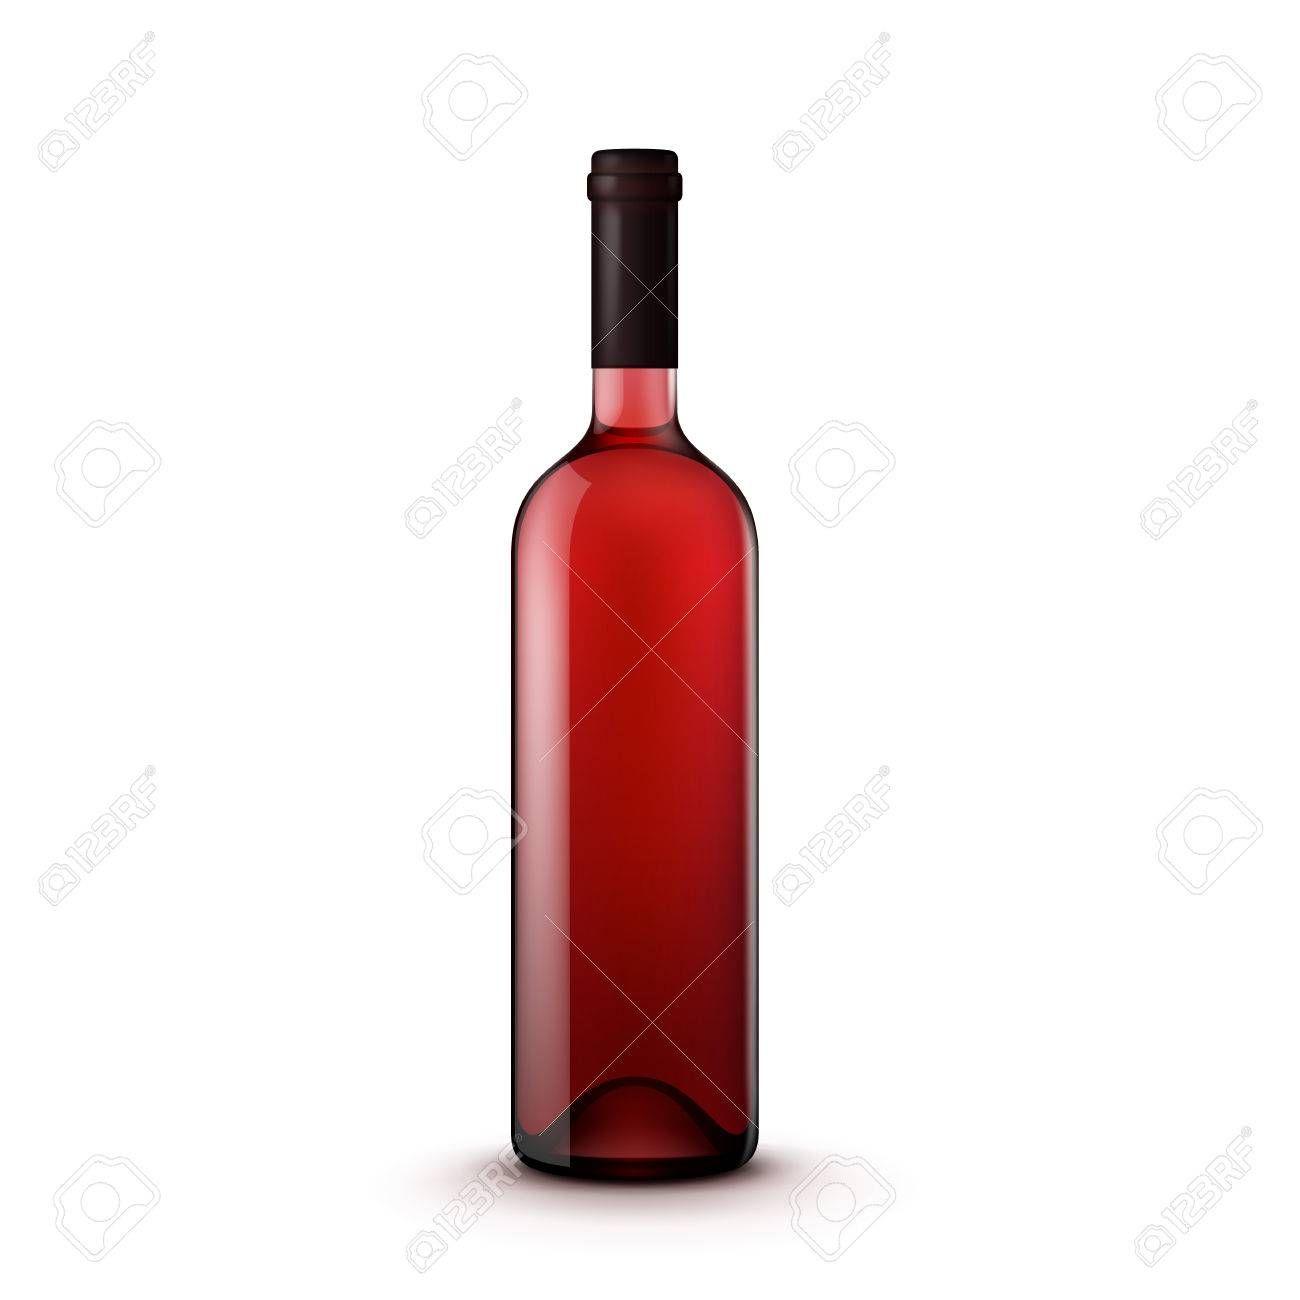 Glass Wine Bottle Illustration Sponsored Wine Glass Illustration Bottle In 2020 With Images Wine Bottle Illustration Wine Bottle Bottle